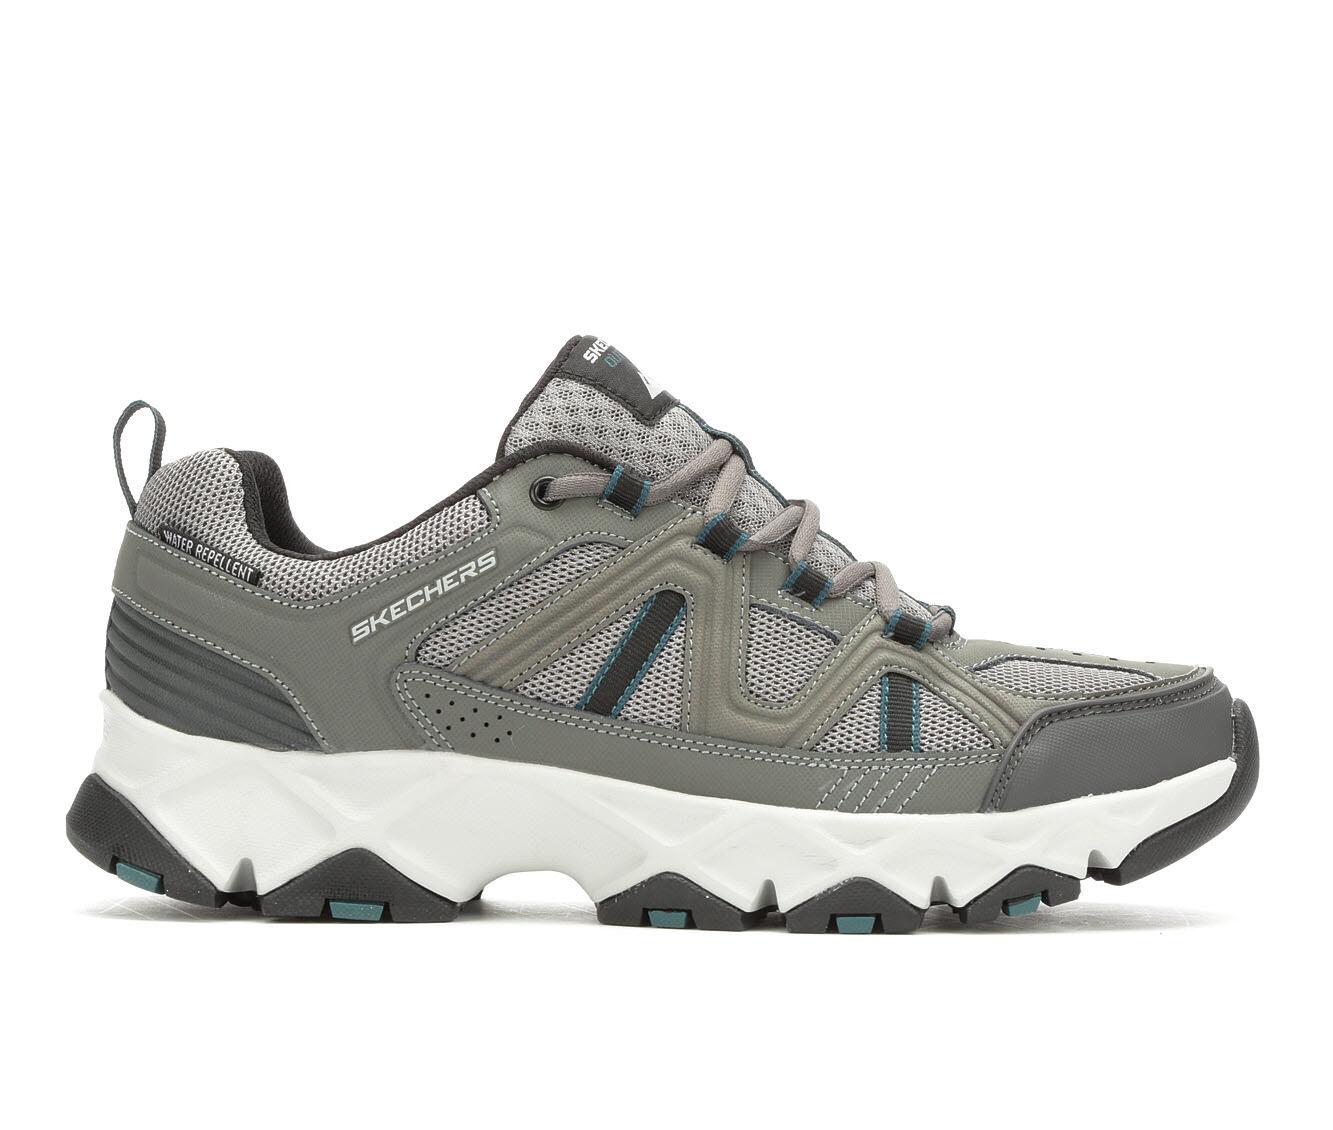 Men's Skechers Crossbar 51885 Training Shoes Dk Gy/Bk/Wht